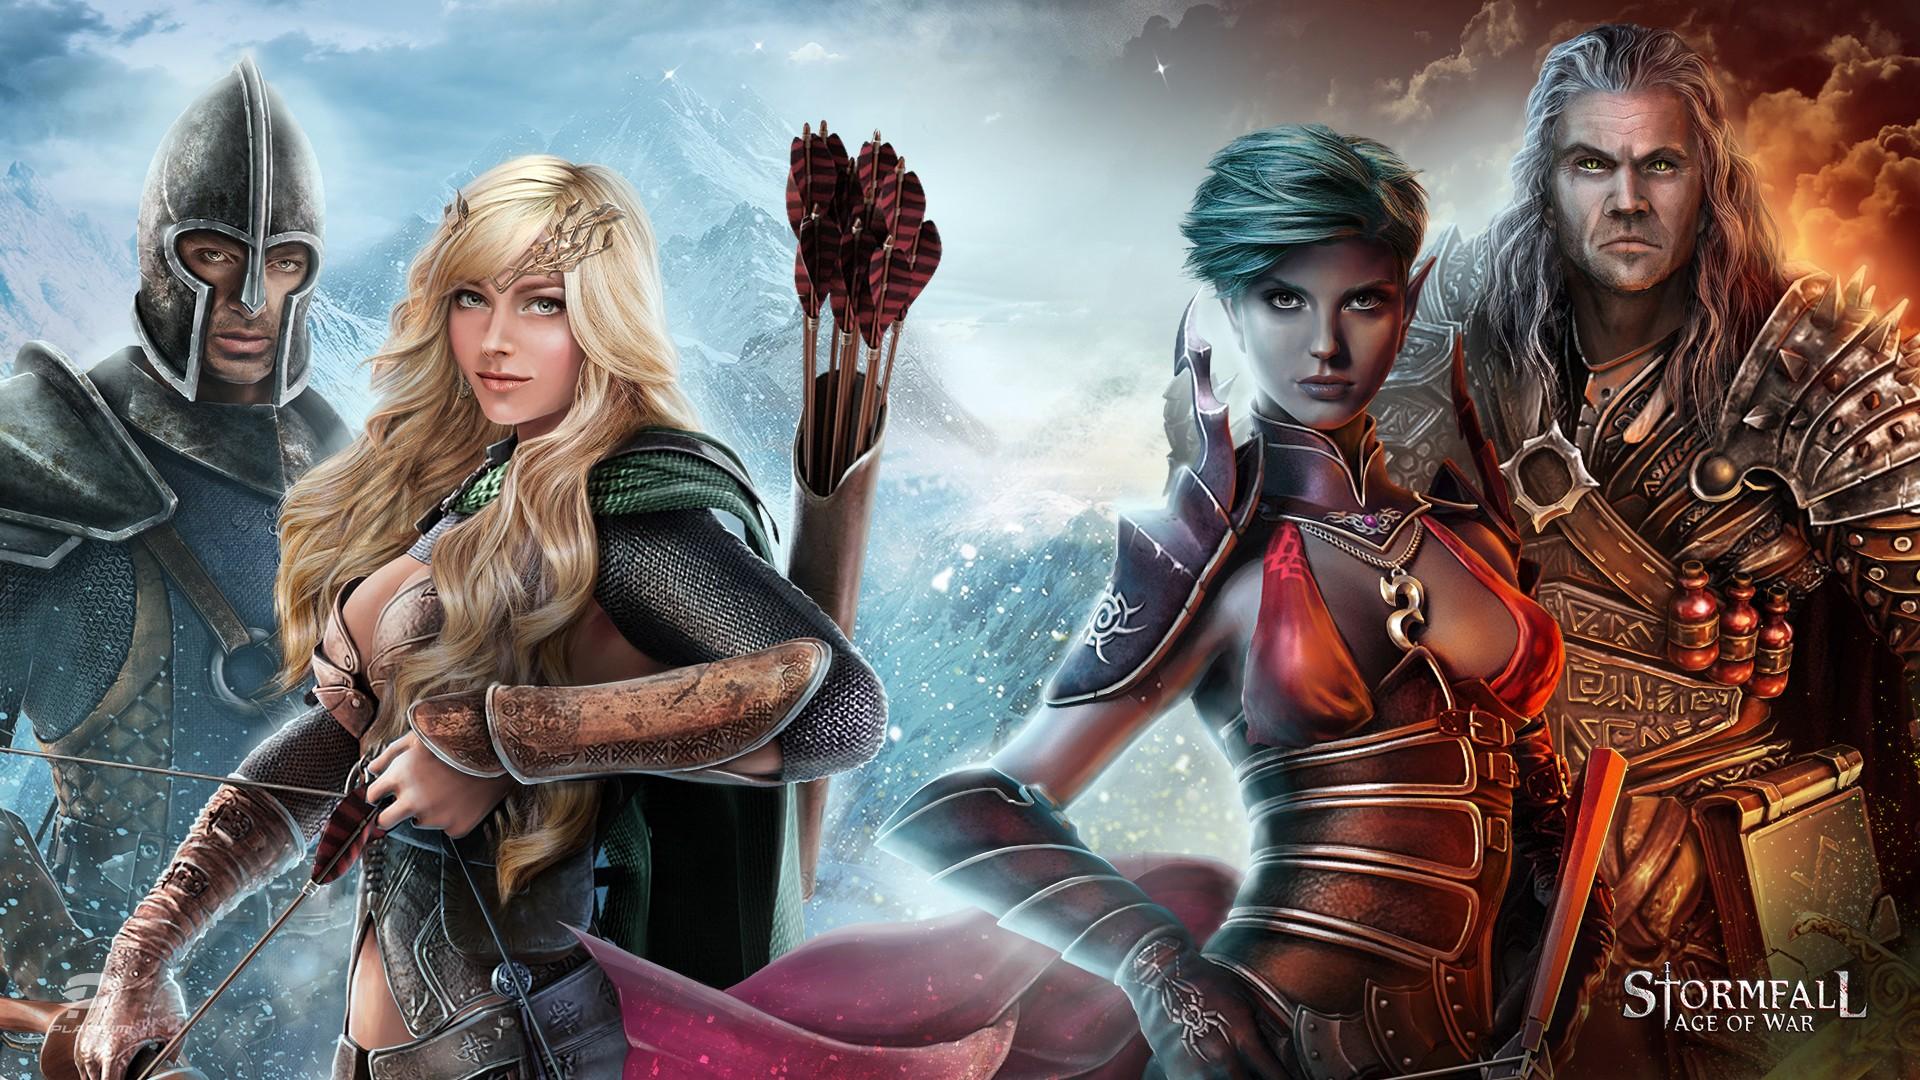 Stormfall : Rise Of War un Moba qui a la classe !